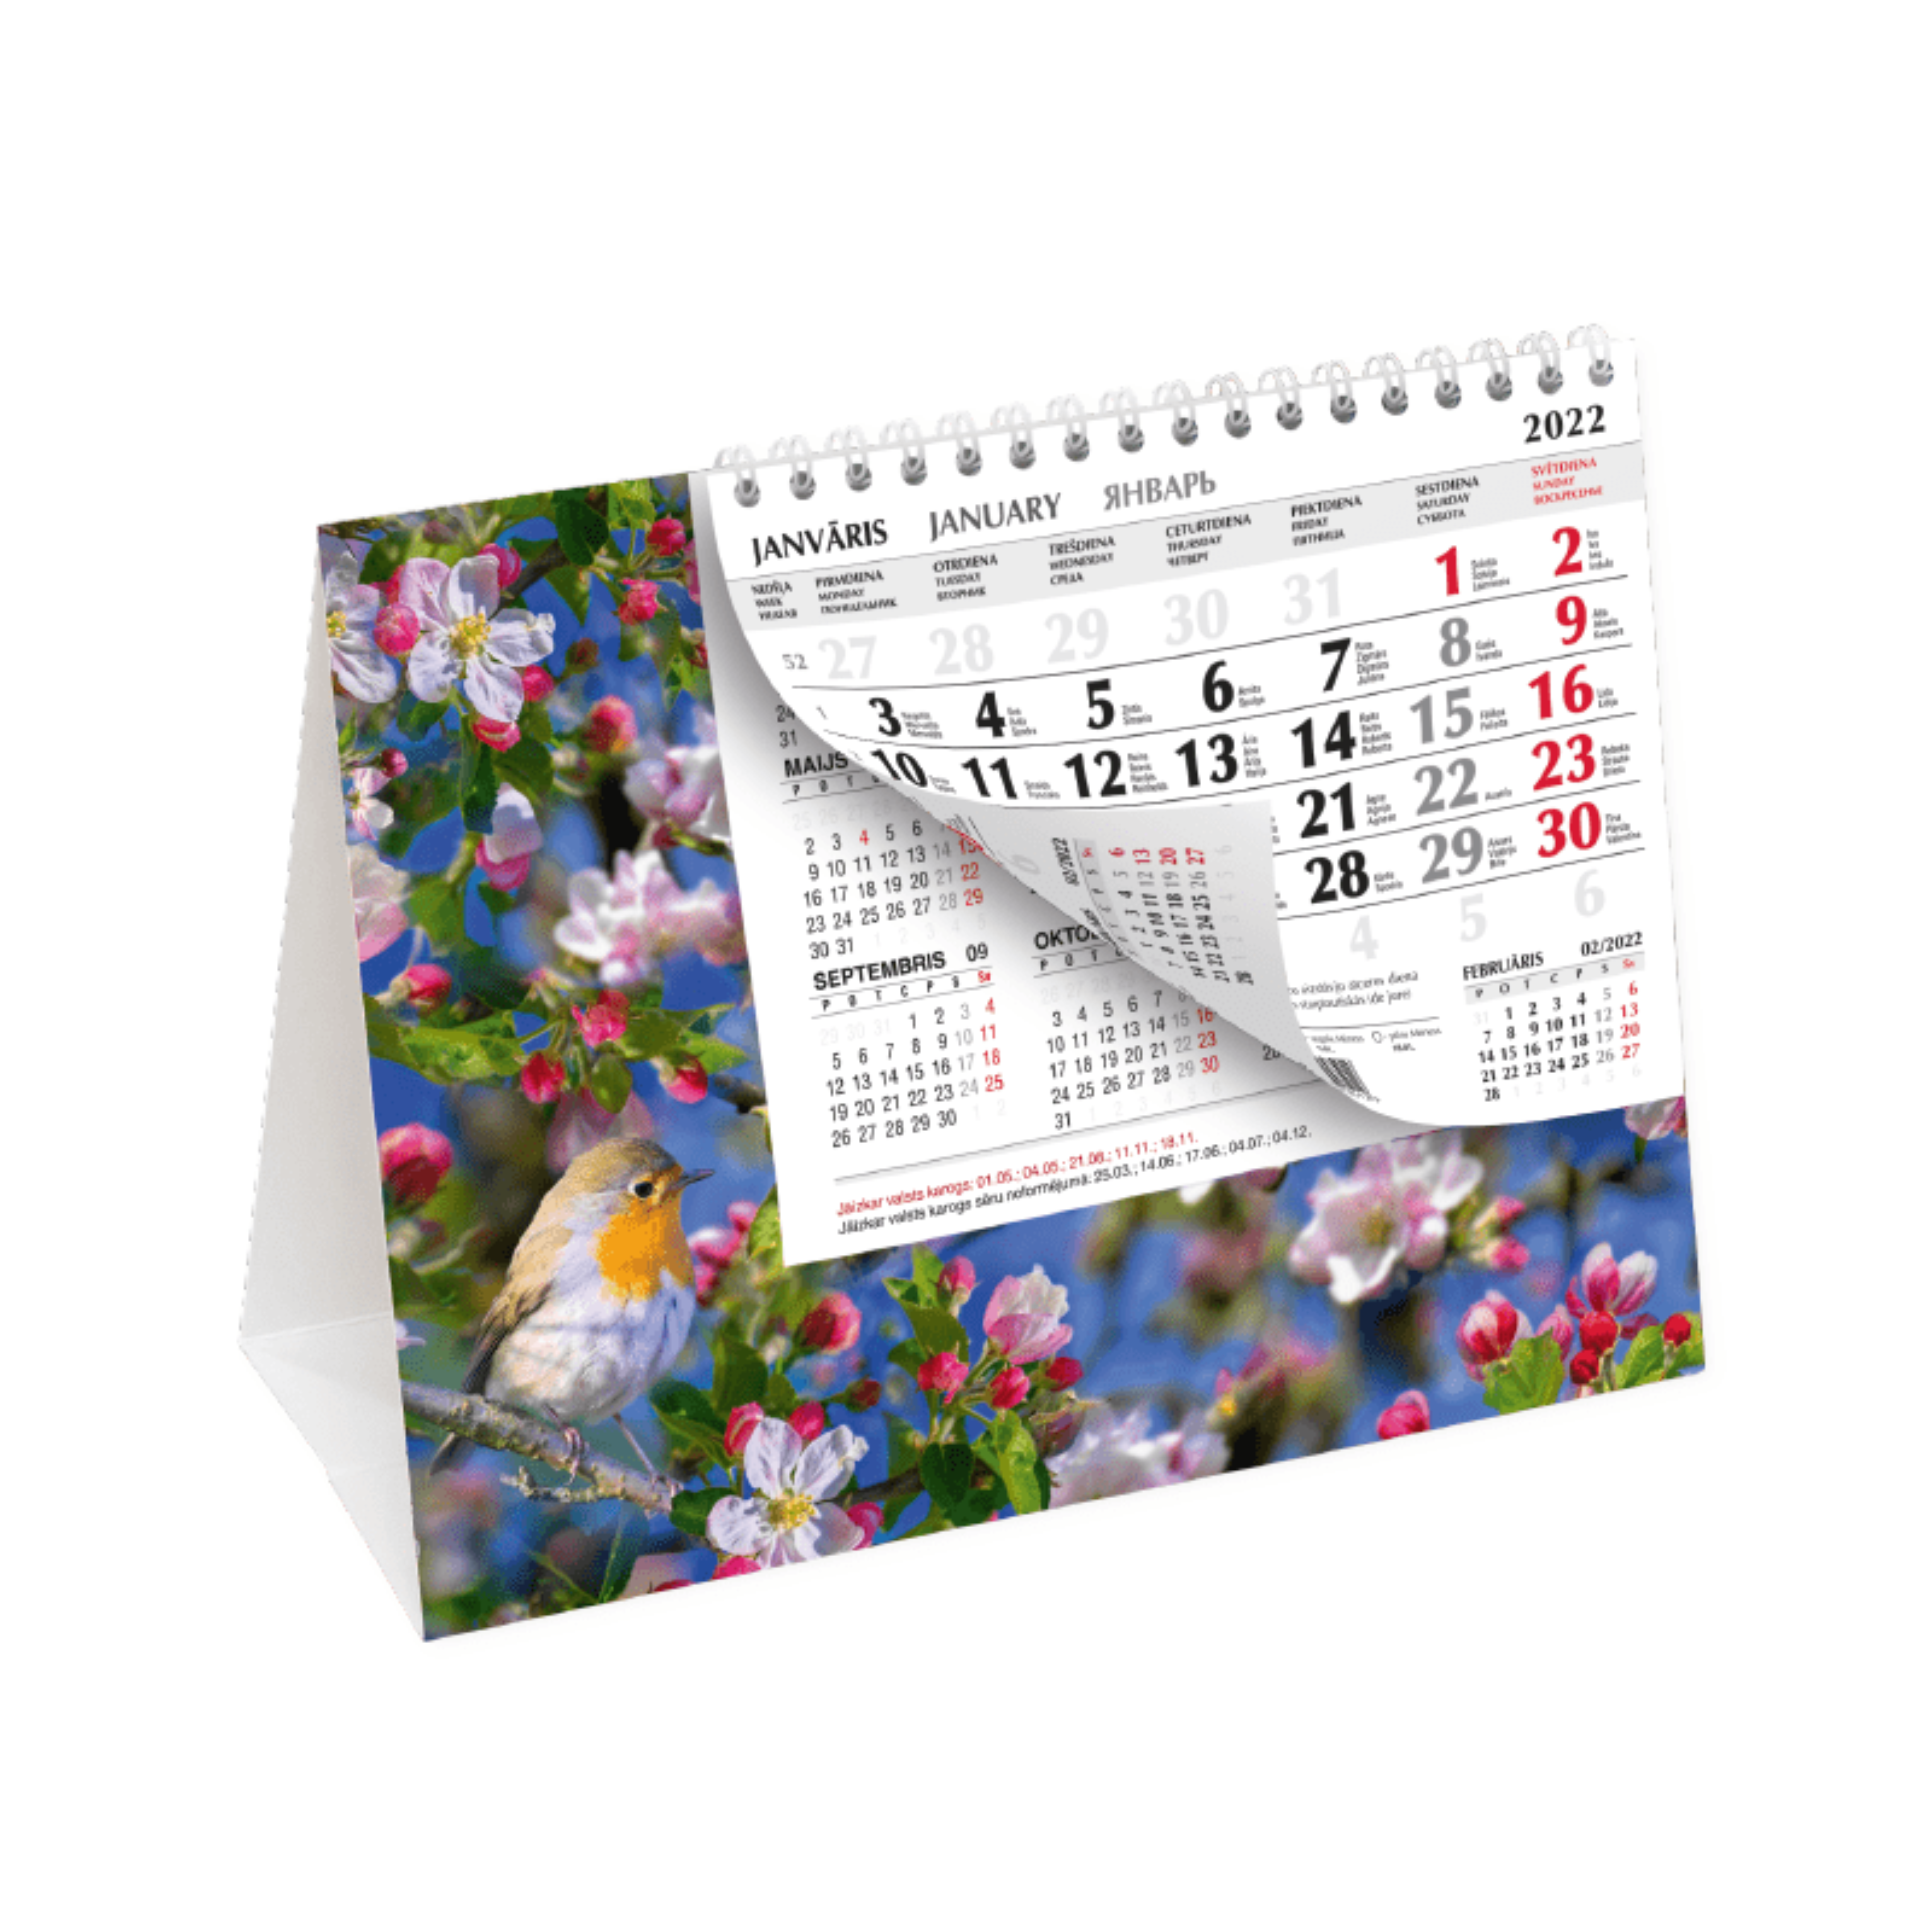 Galda kalendārs 2020.gadam Mobile Serviss Pyramid,..